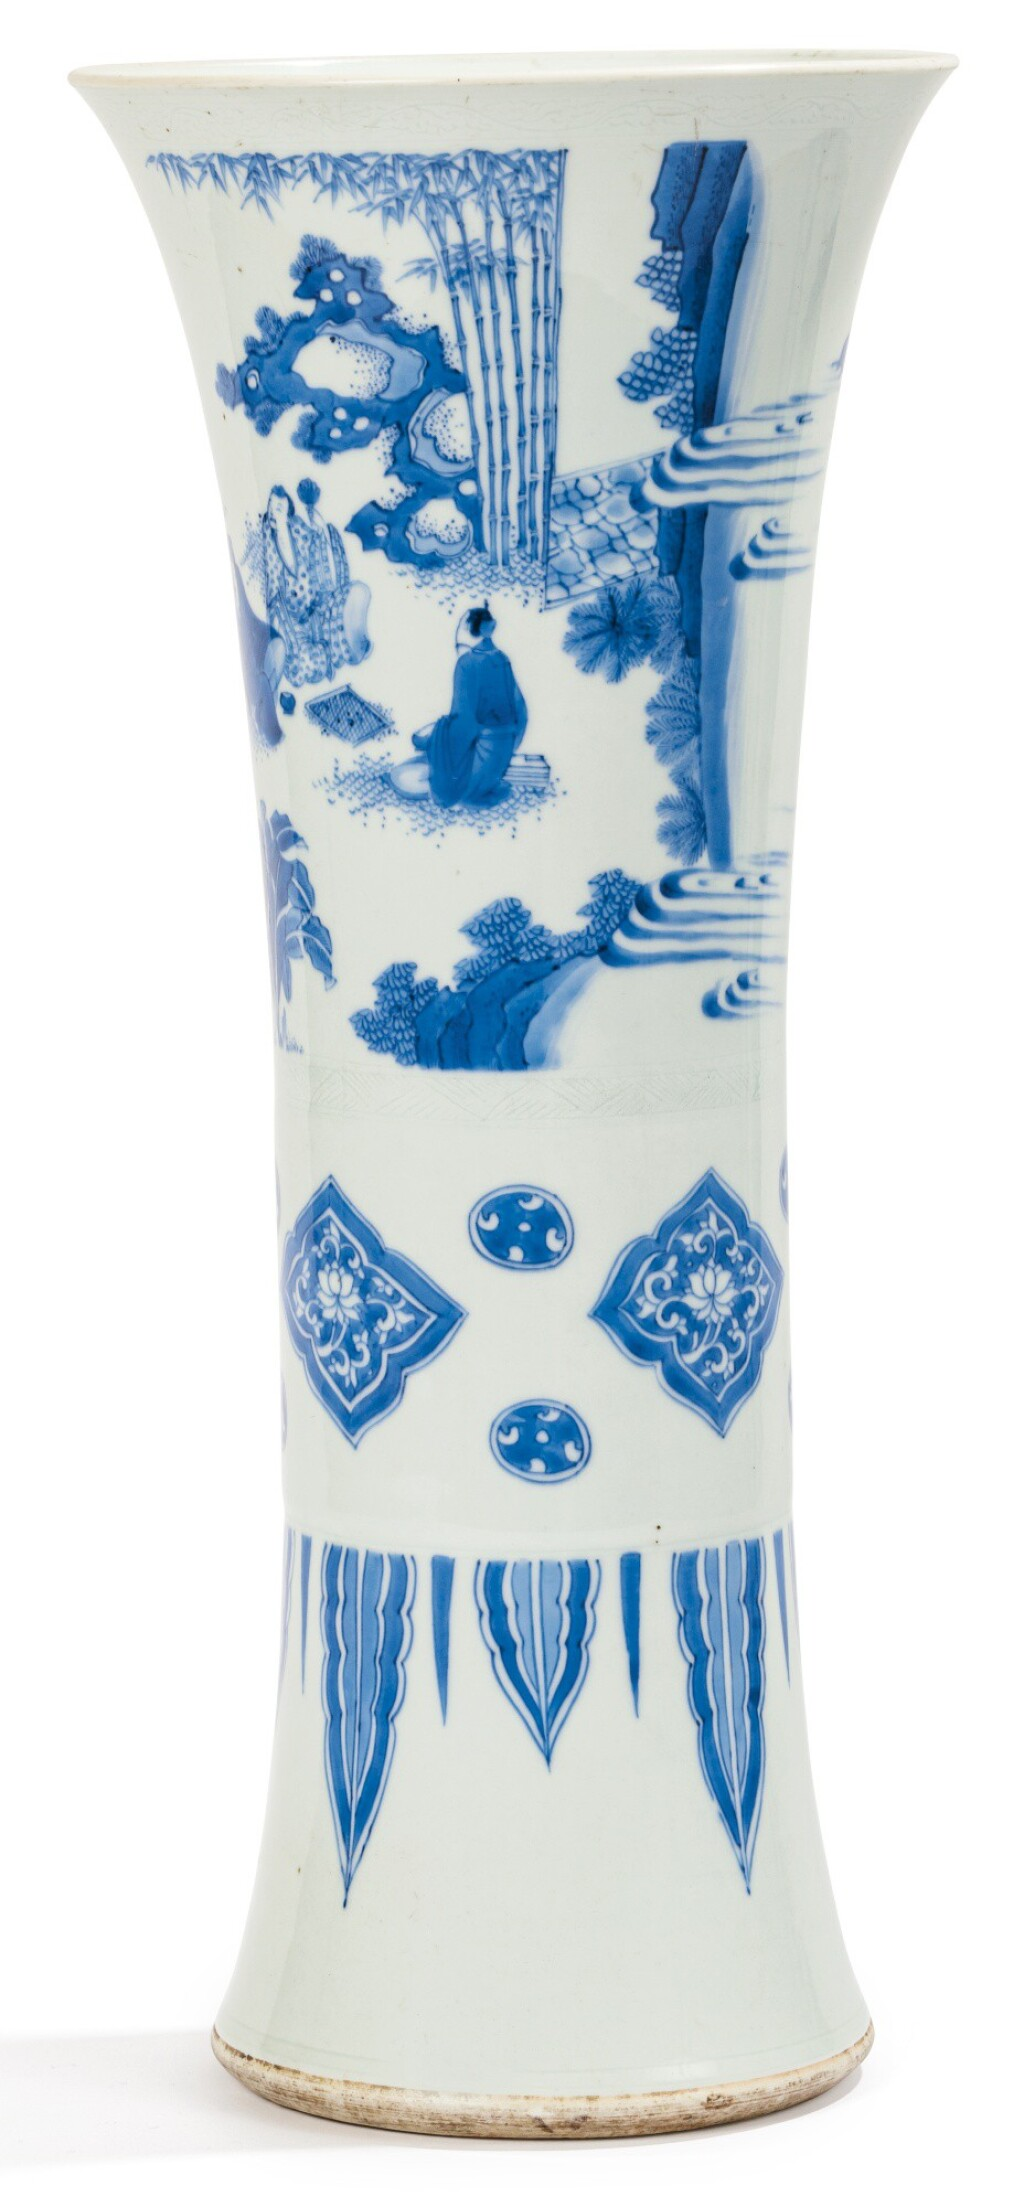 VASE CORNET EN PORCELAINE BLEU BLANC EPOQUE TRANSITION, XVIIE SIÈCLE | 十七世紀 青花竹林七賢圖花觚 | A blue and white beaker vase, Transitional period, 17th century